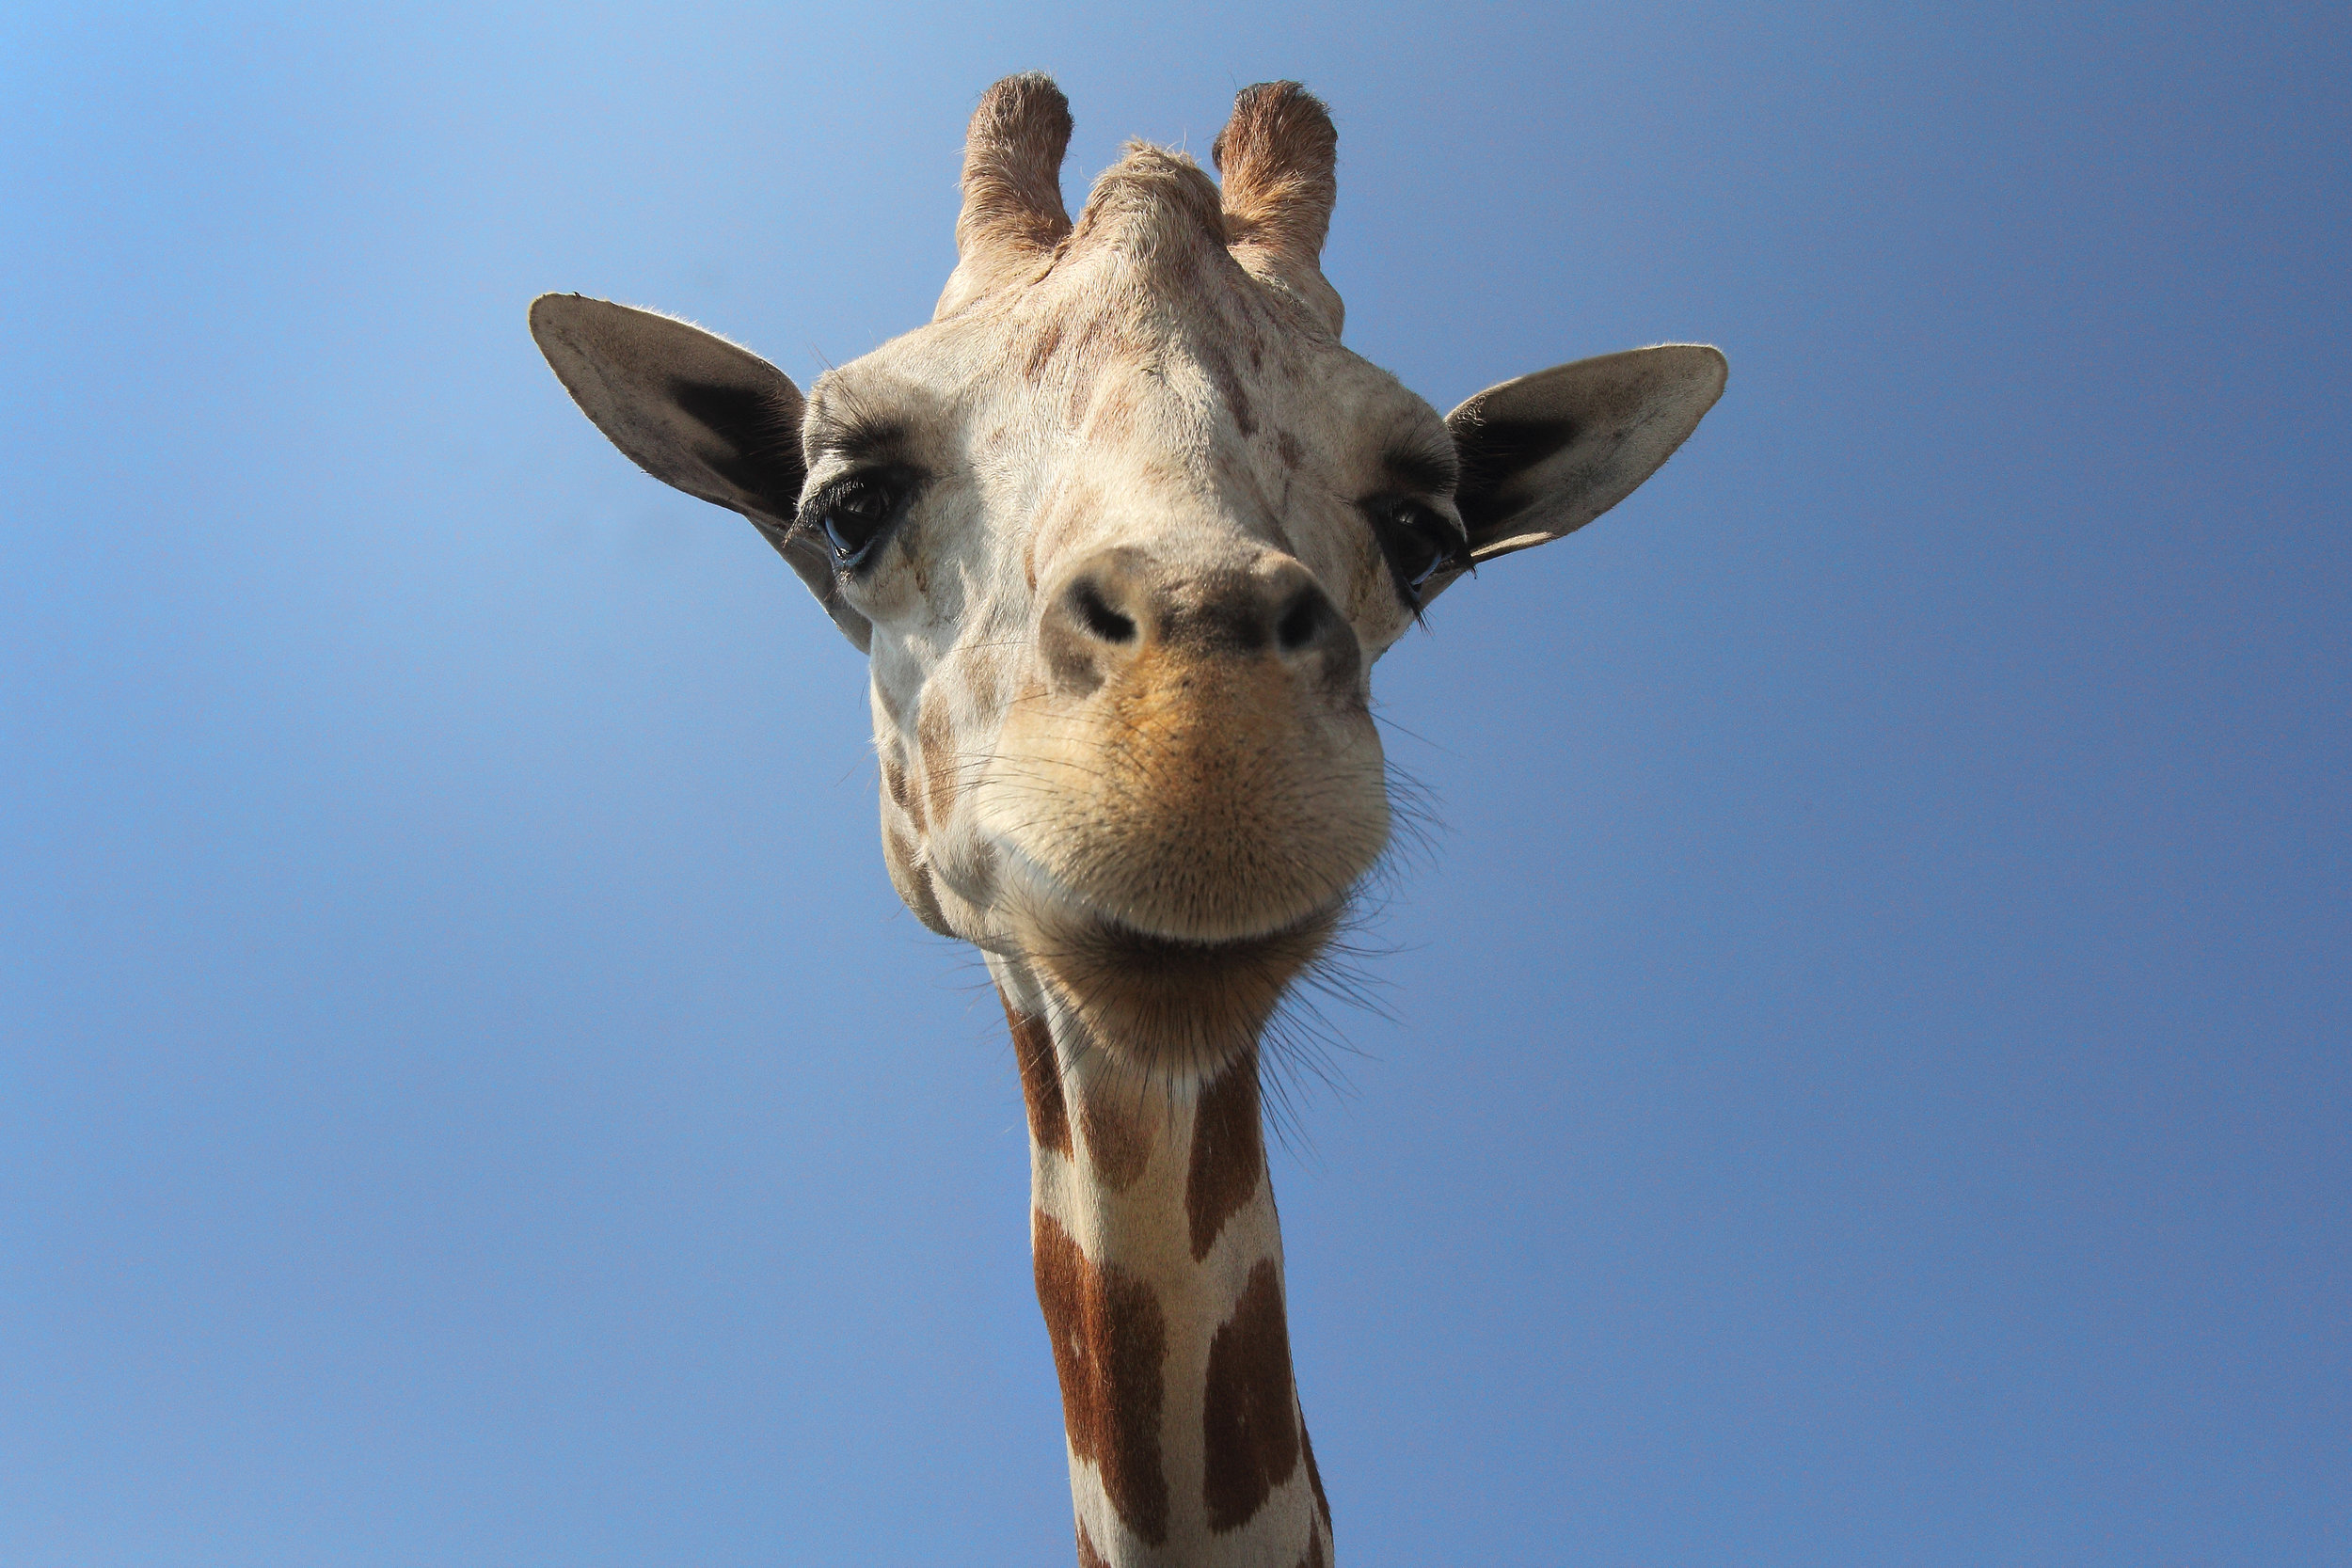 We love giraffes <3